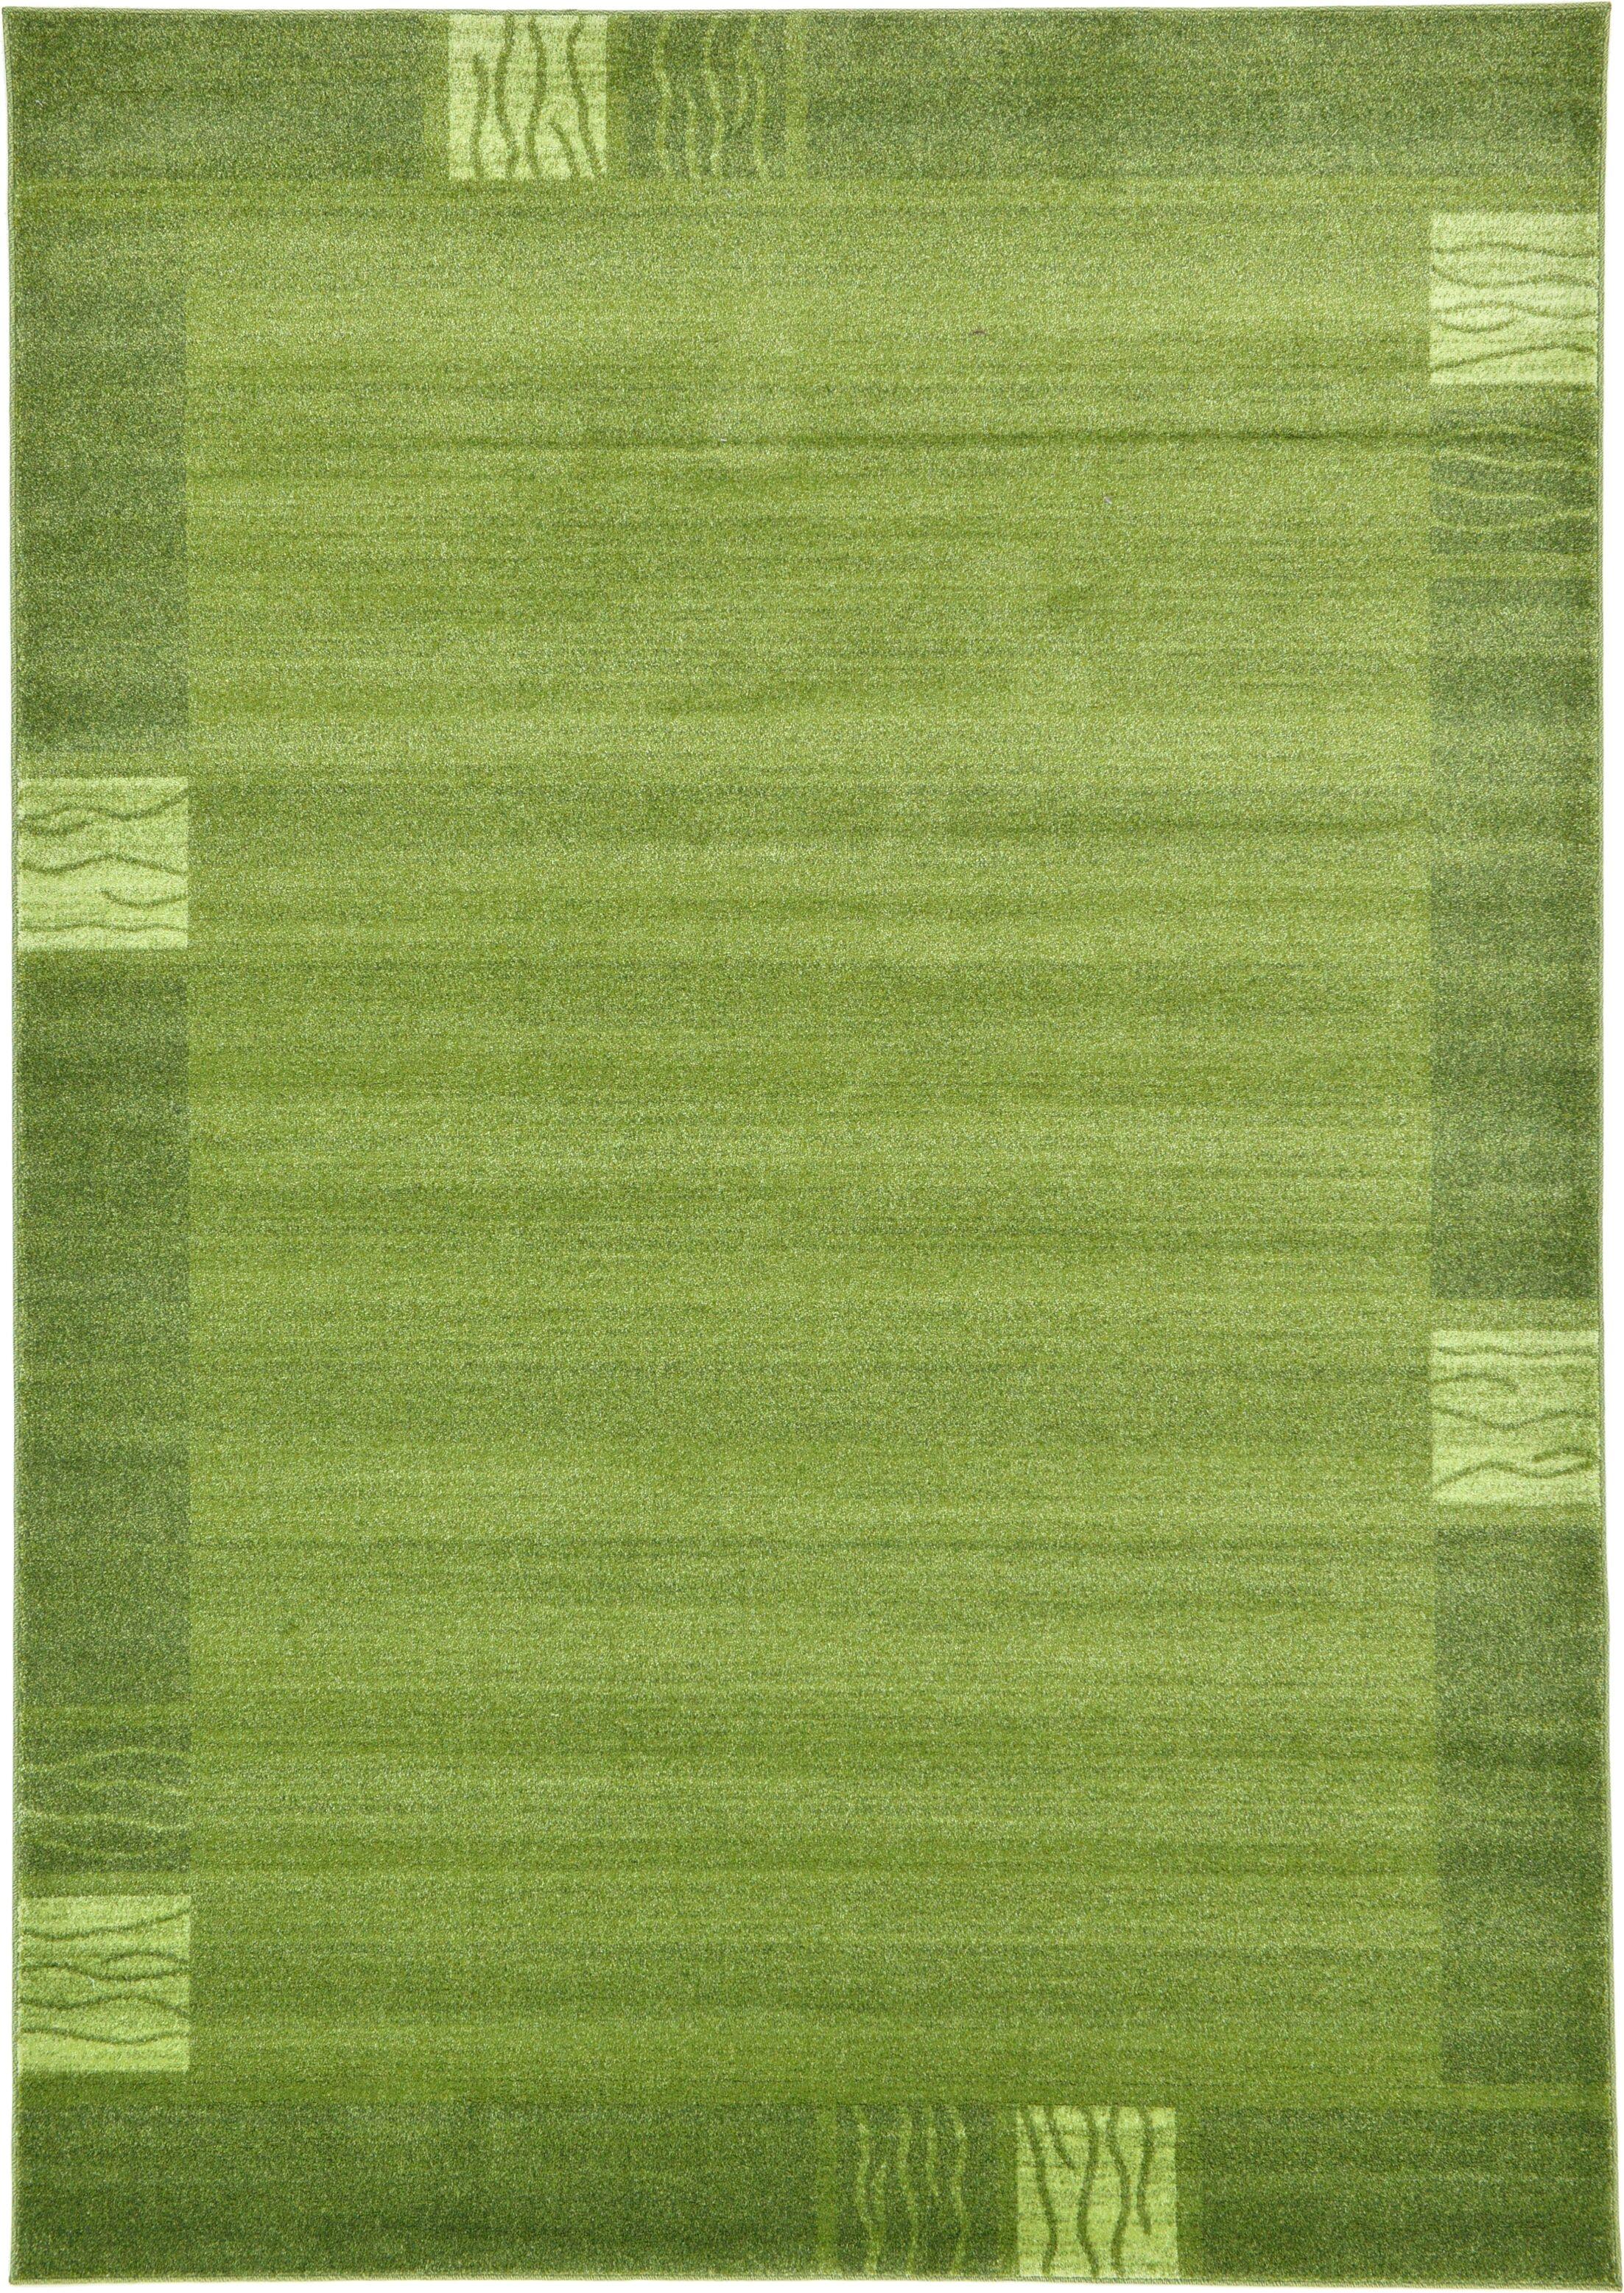 Christi Green Color Bordered Area Rug Rug Size: Rectangle 7' x 10'